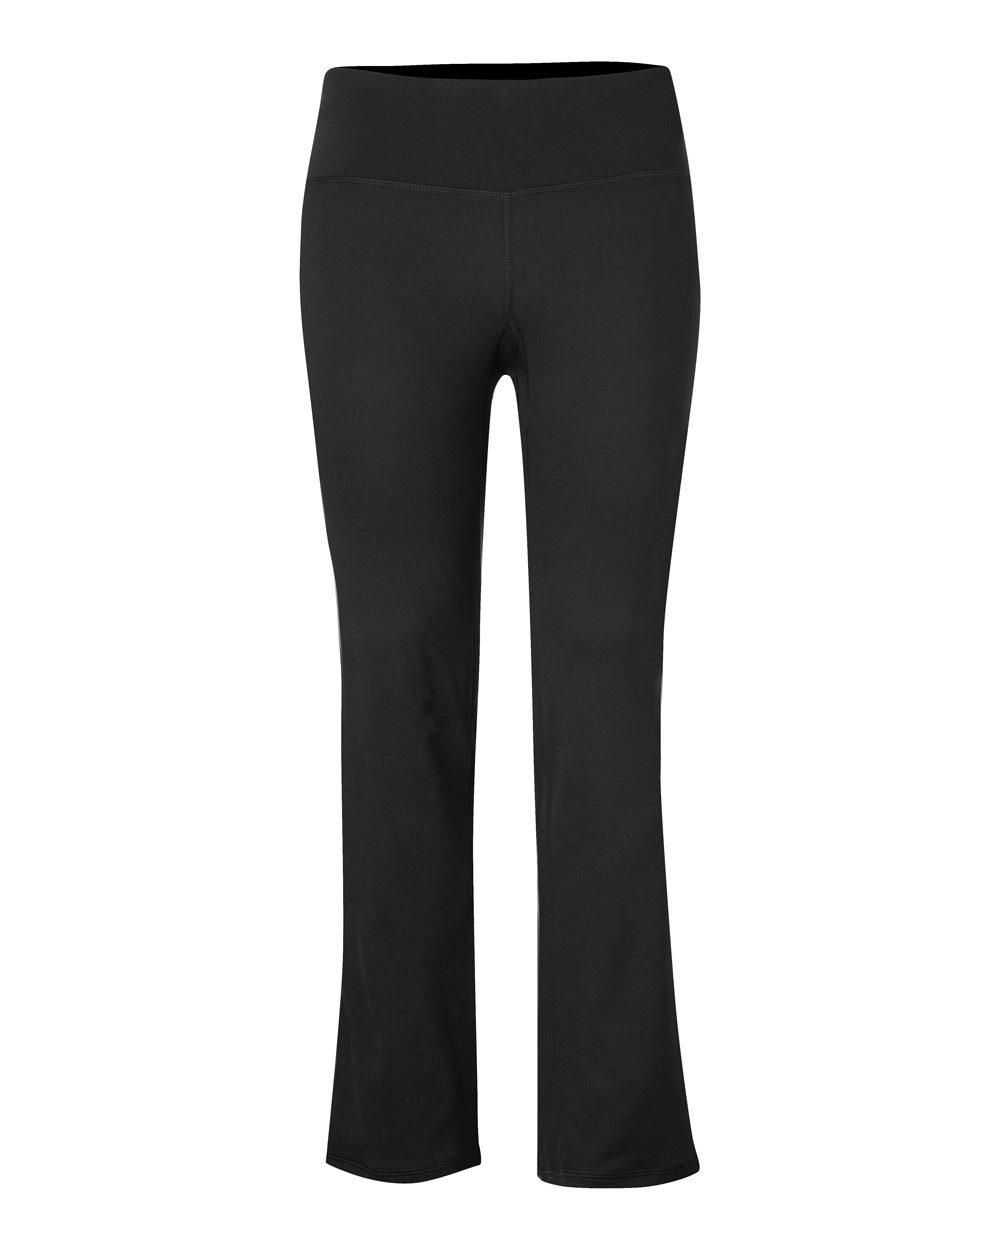 Champion B920 - Women's Performance Yoga Pants